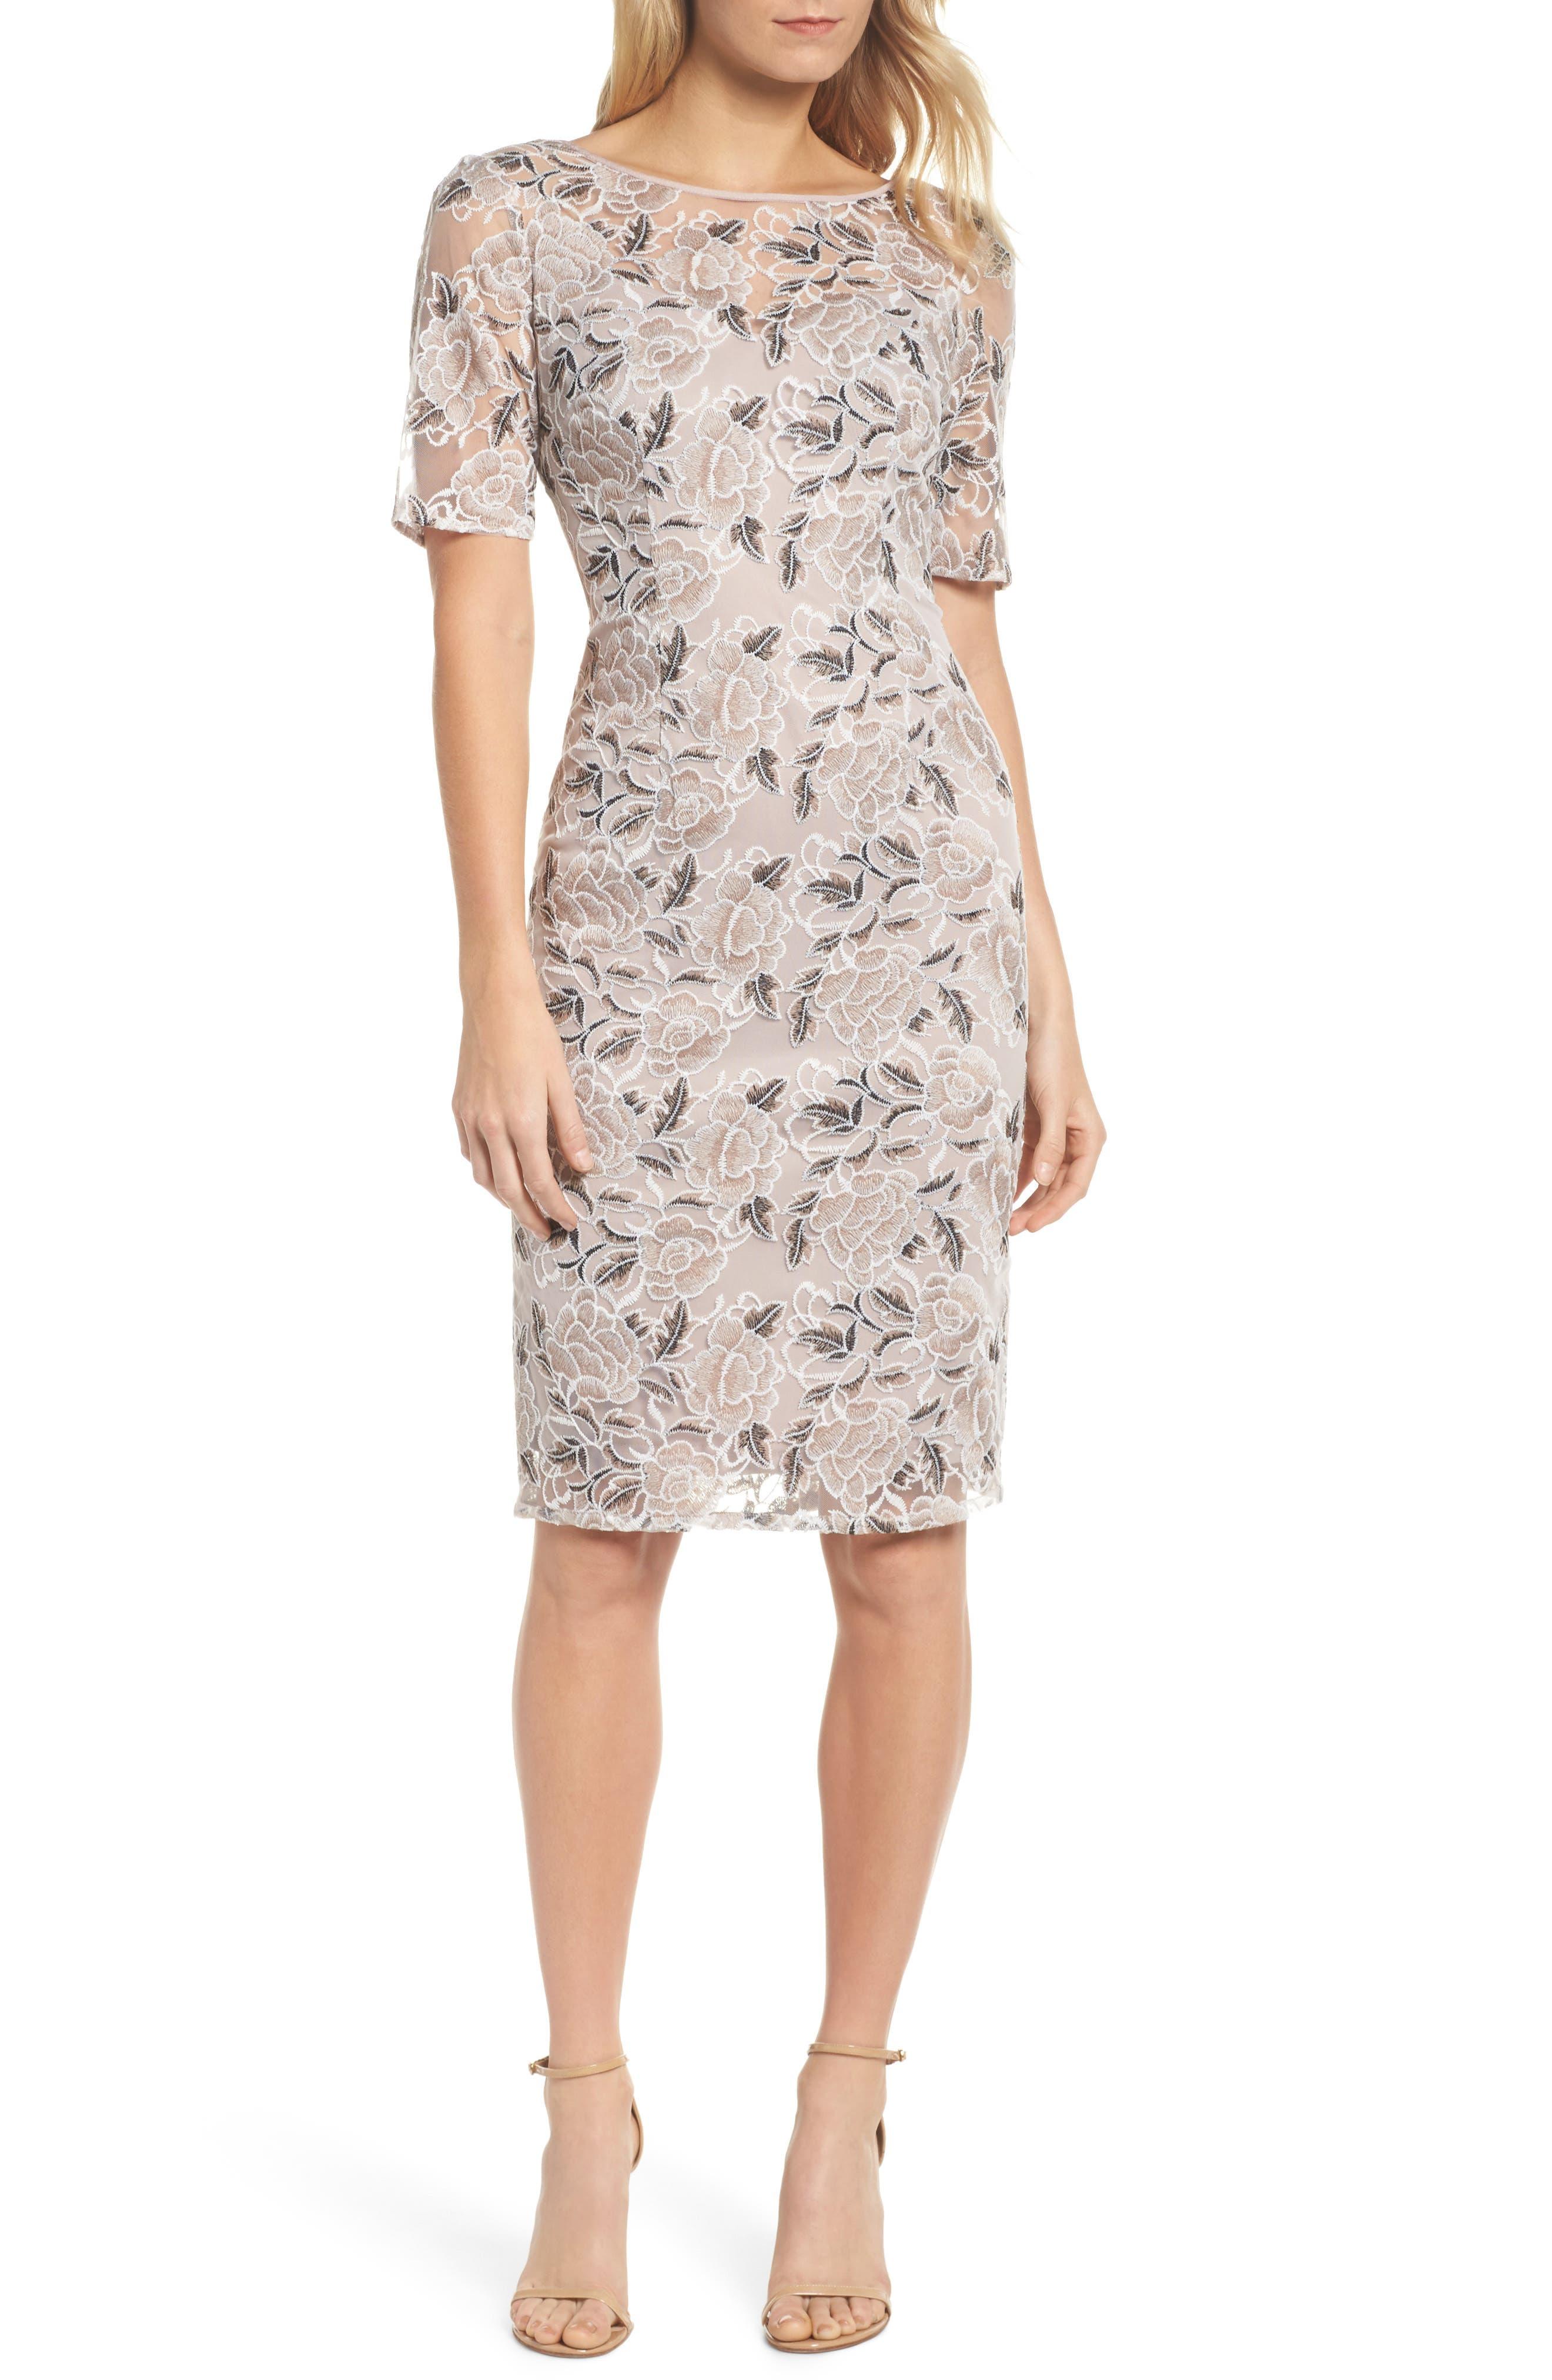 Suzette Embroidered Sheath Dress,                         Main,                         color, Pink Cinnamon Multi